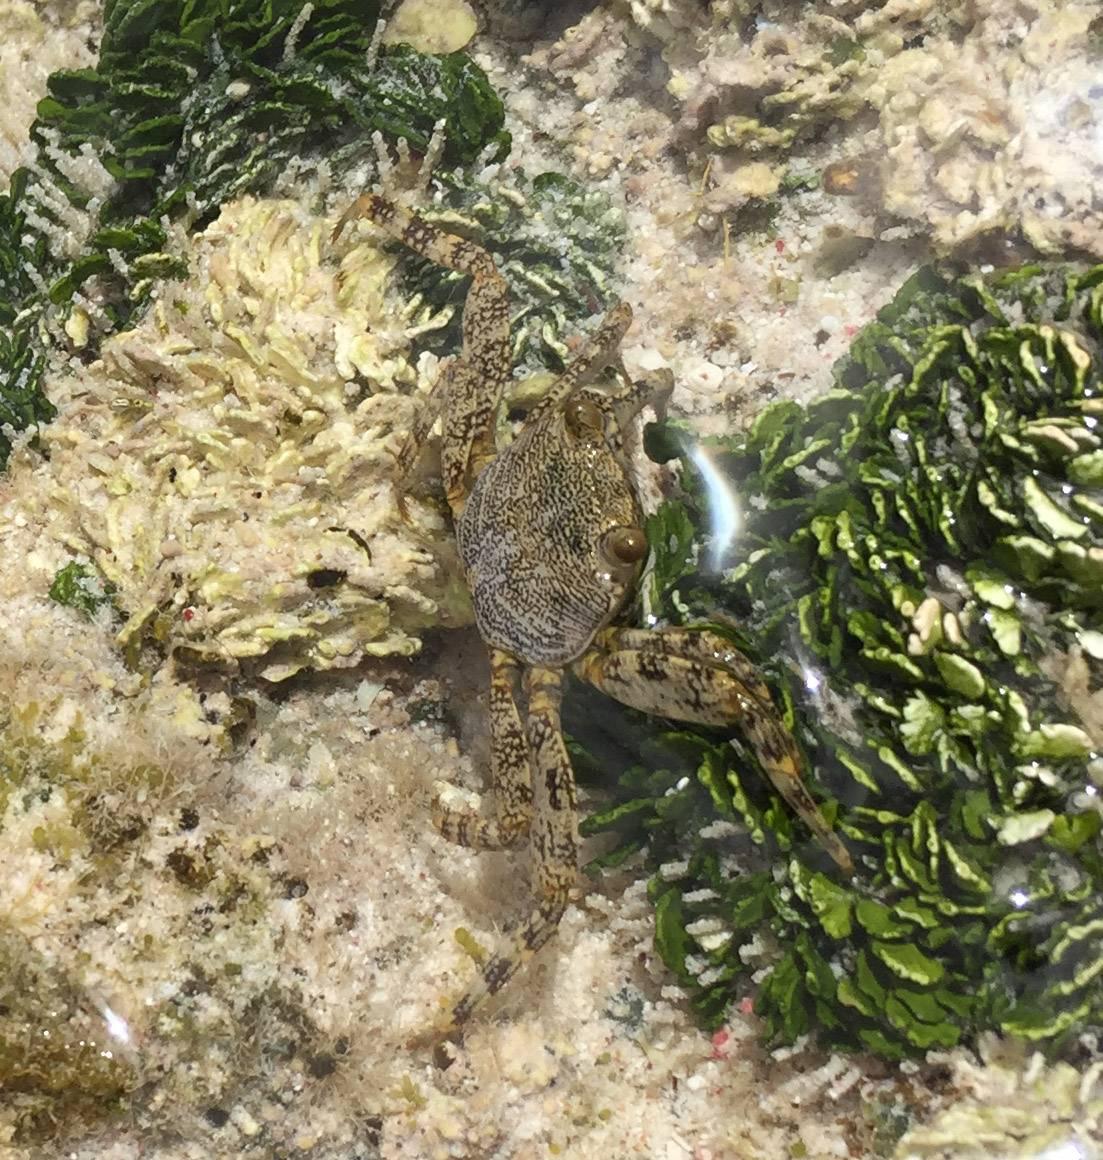 015-img_4116-crab-in-tide-pool